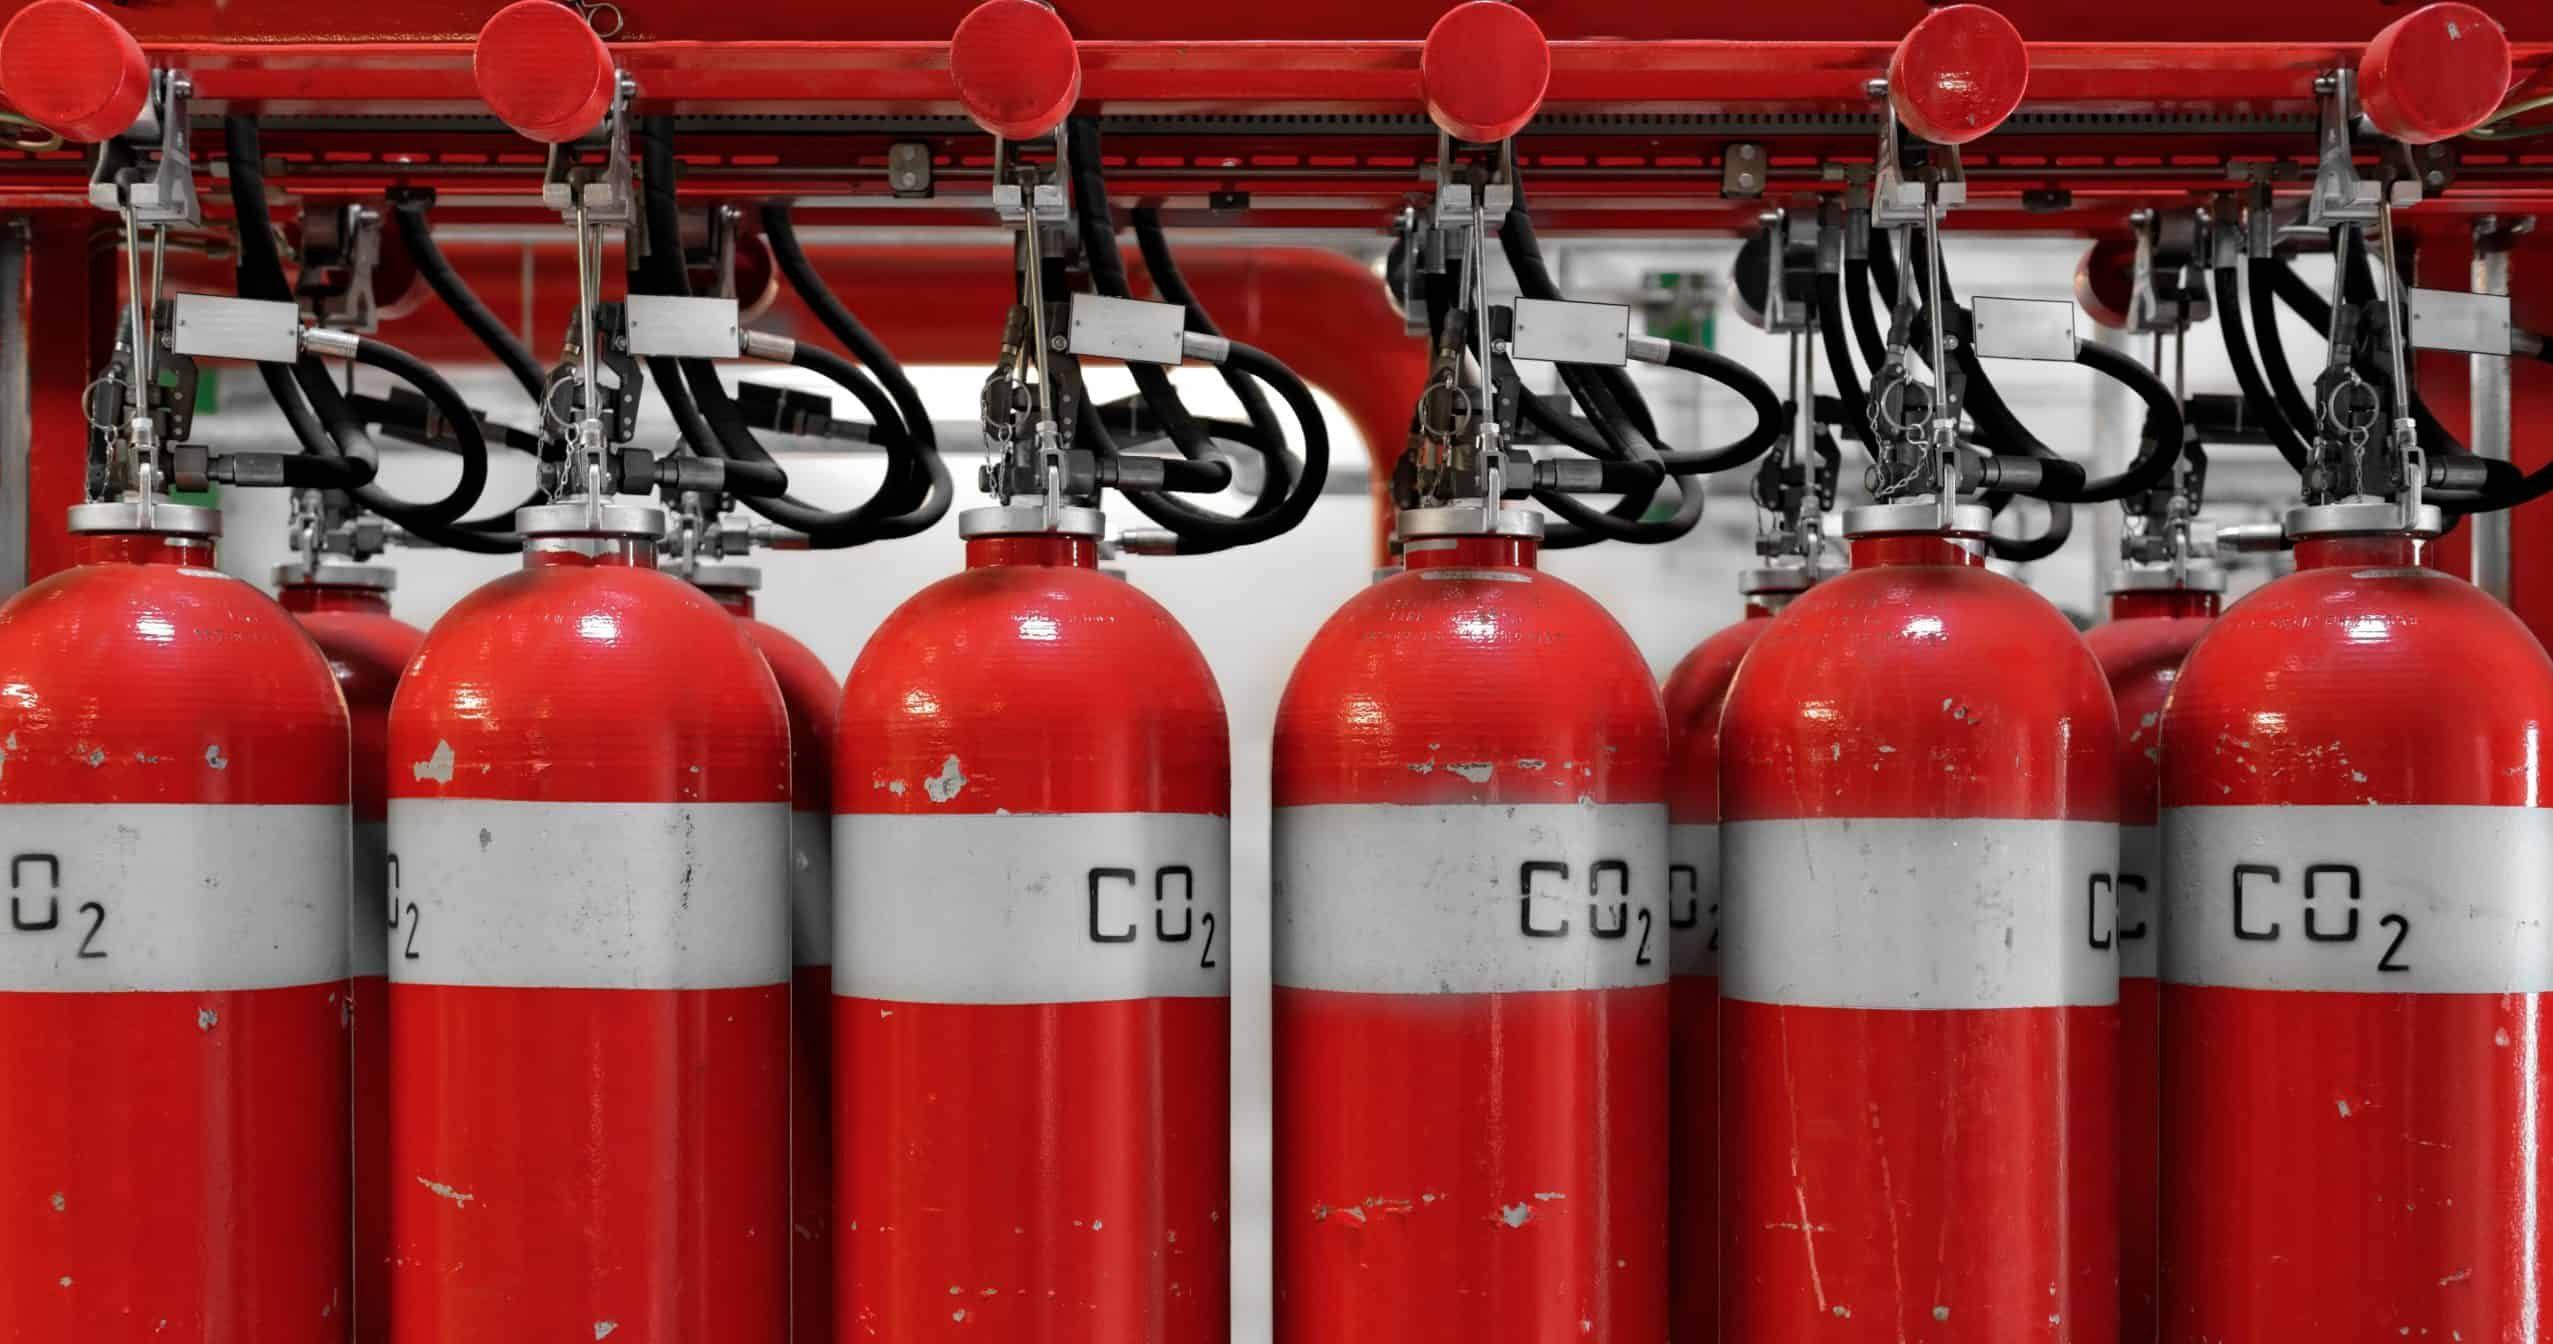 brandblussers opgesteld